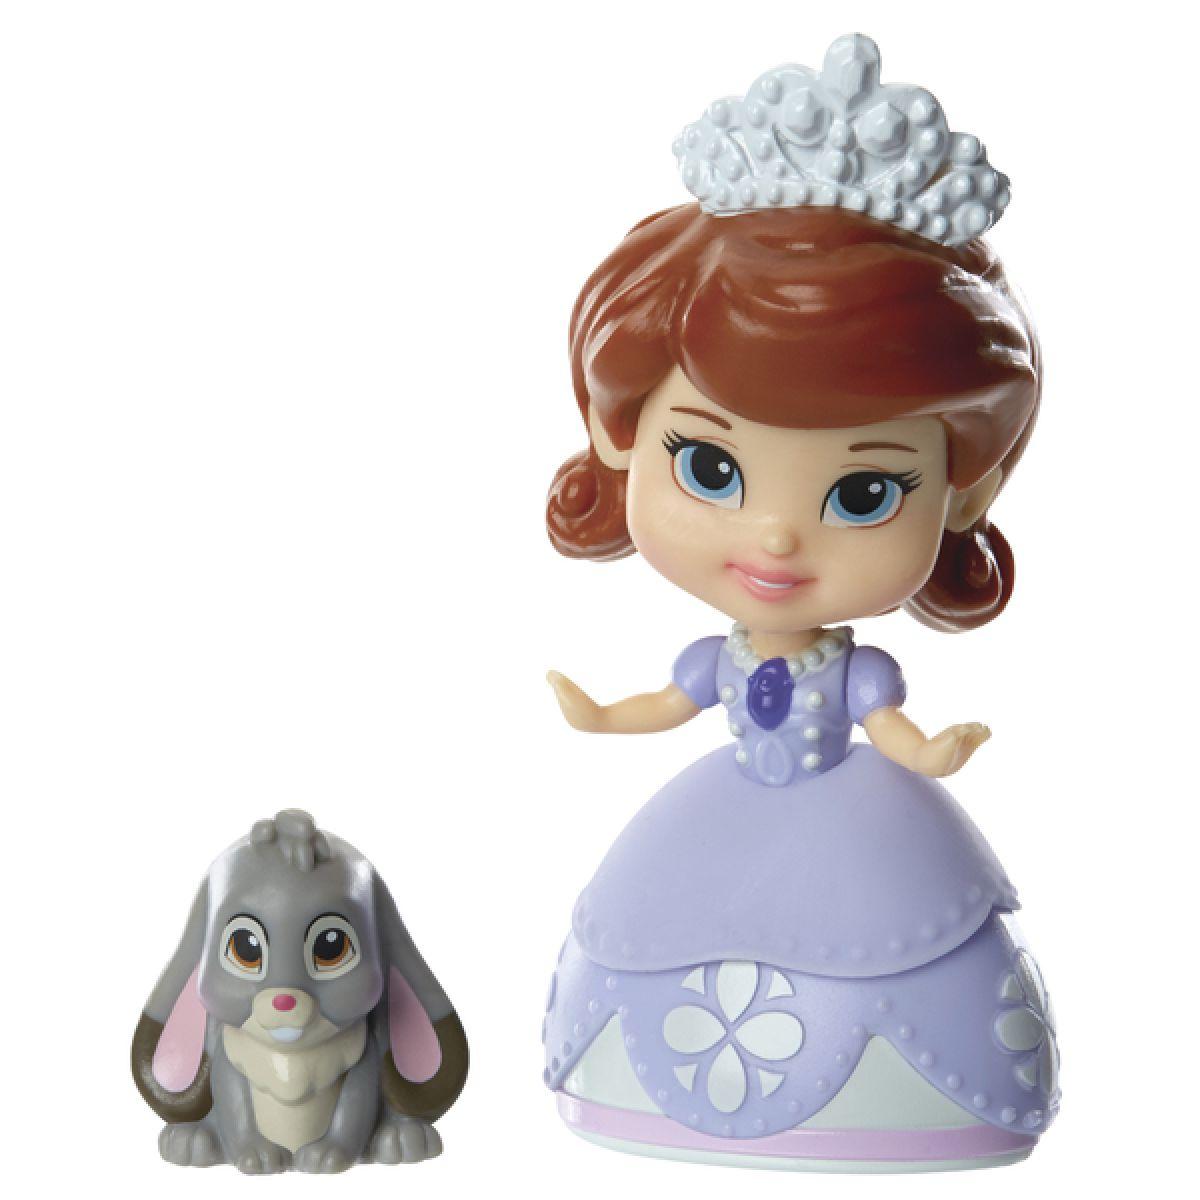 Jakks Pacific Disney Mini princezna a kamarád Sofia and Clover